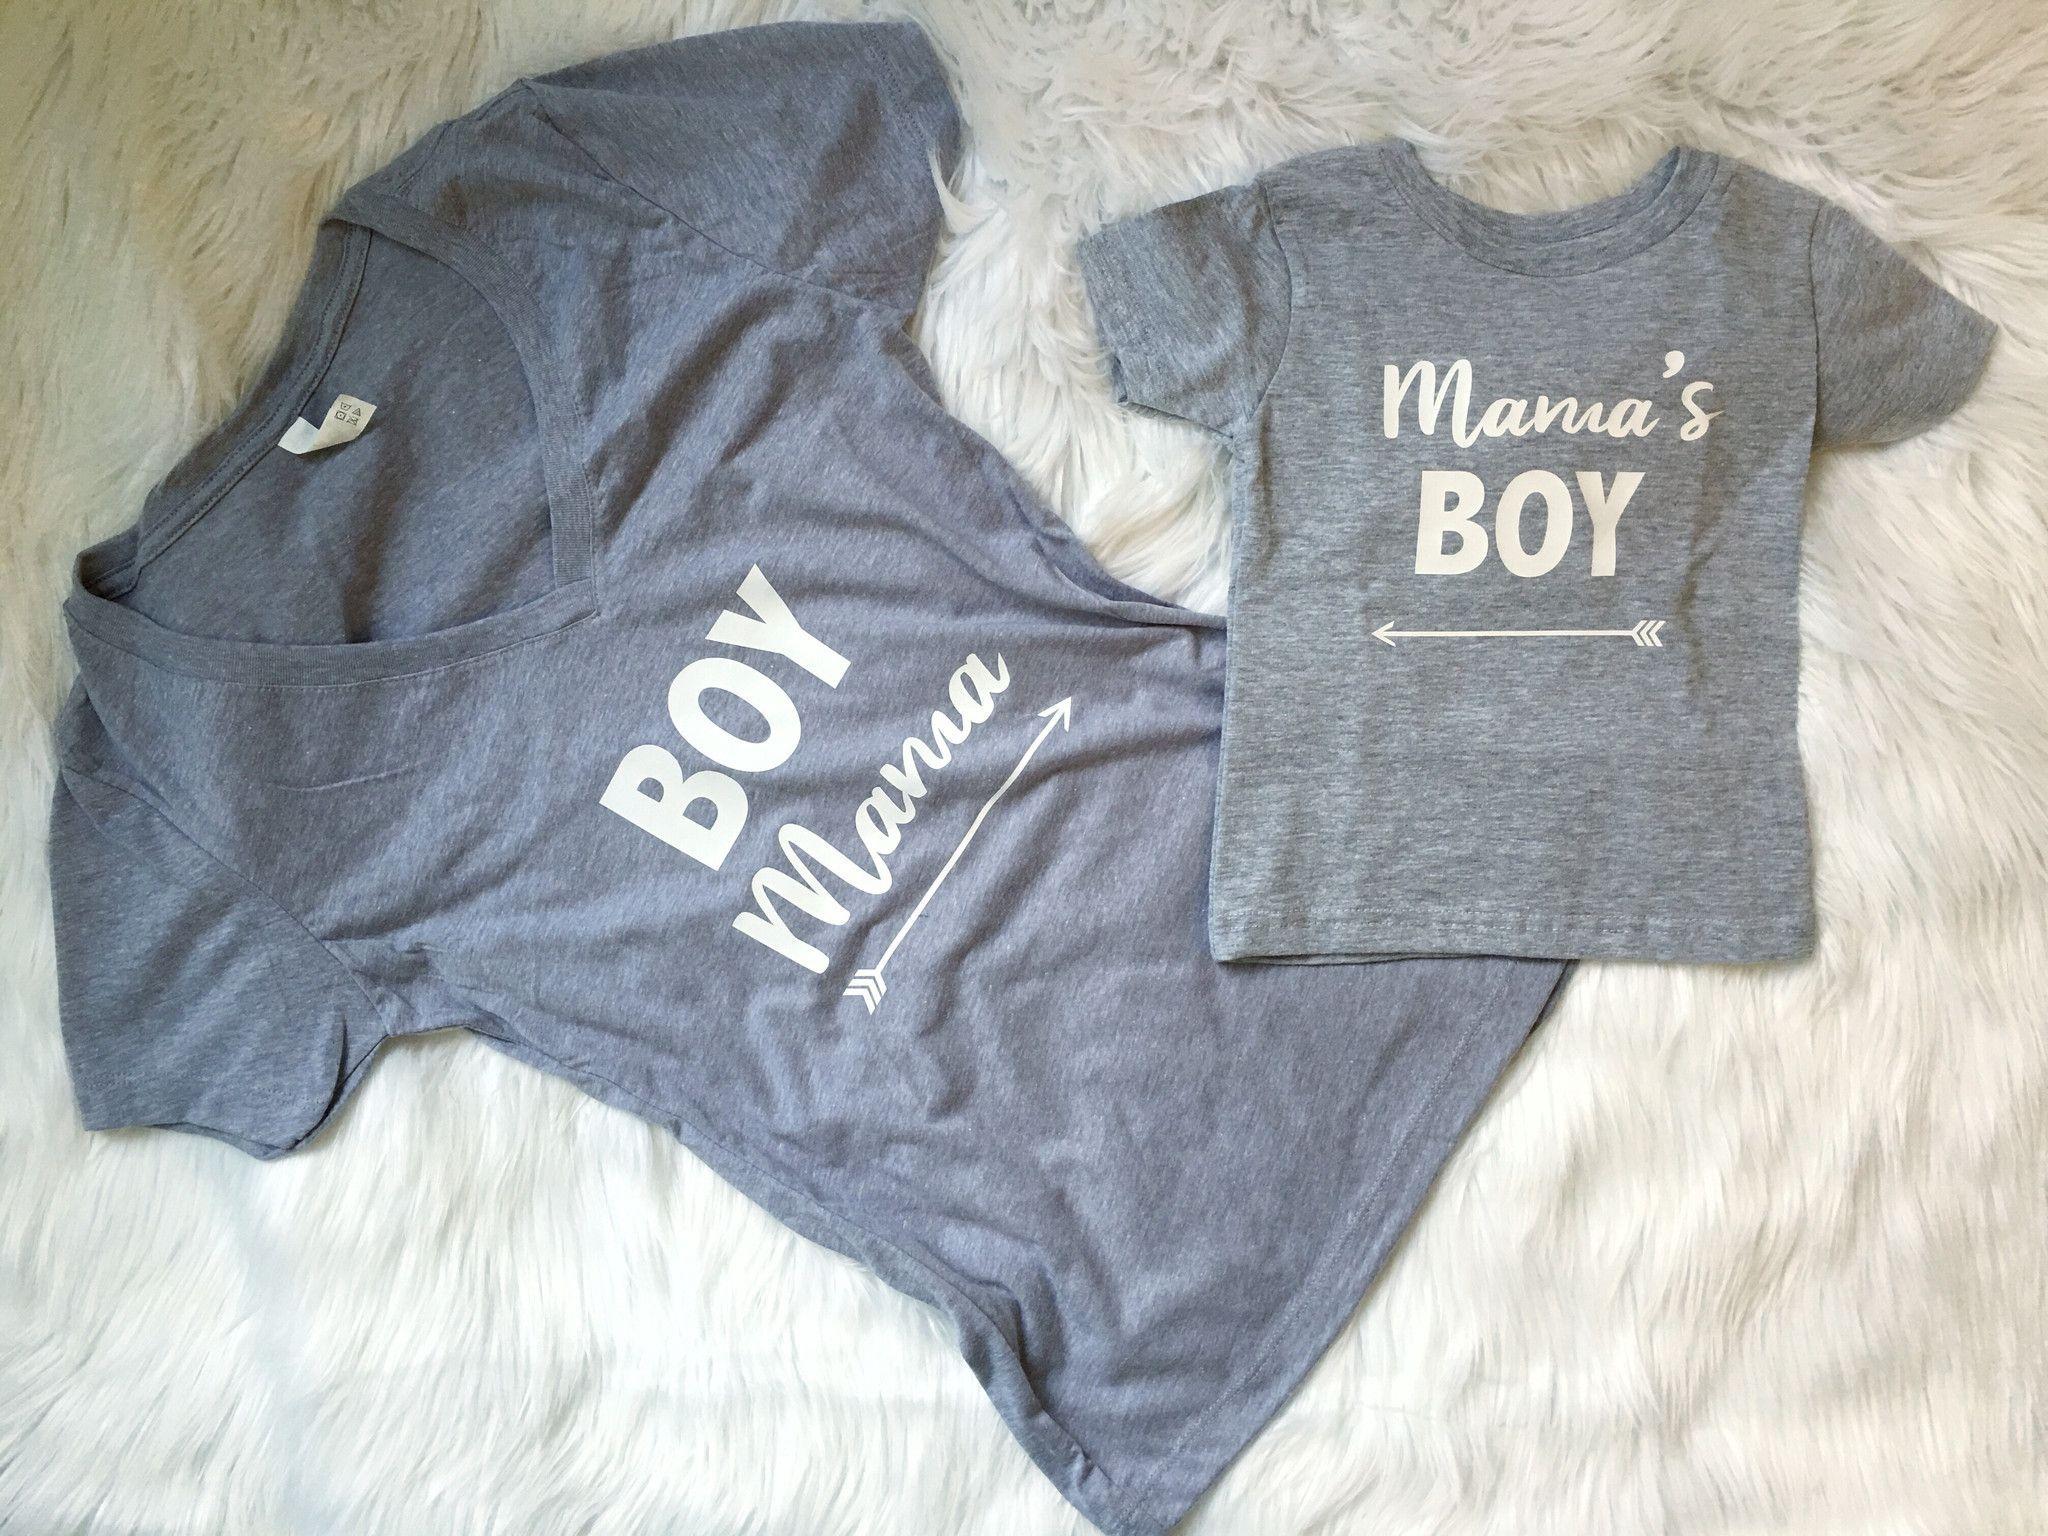 4aecbe760a72 Boy mama - mamas boy set - mommy and me set - mamas boy shirt set ...